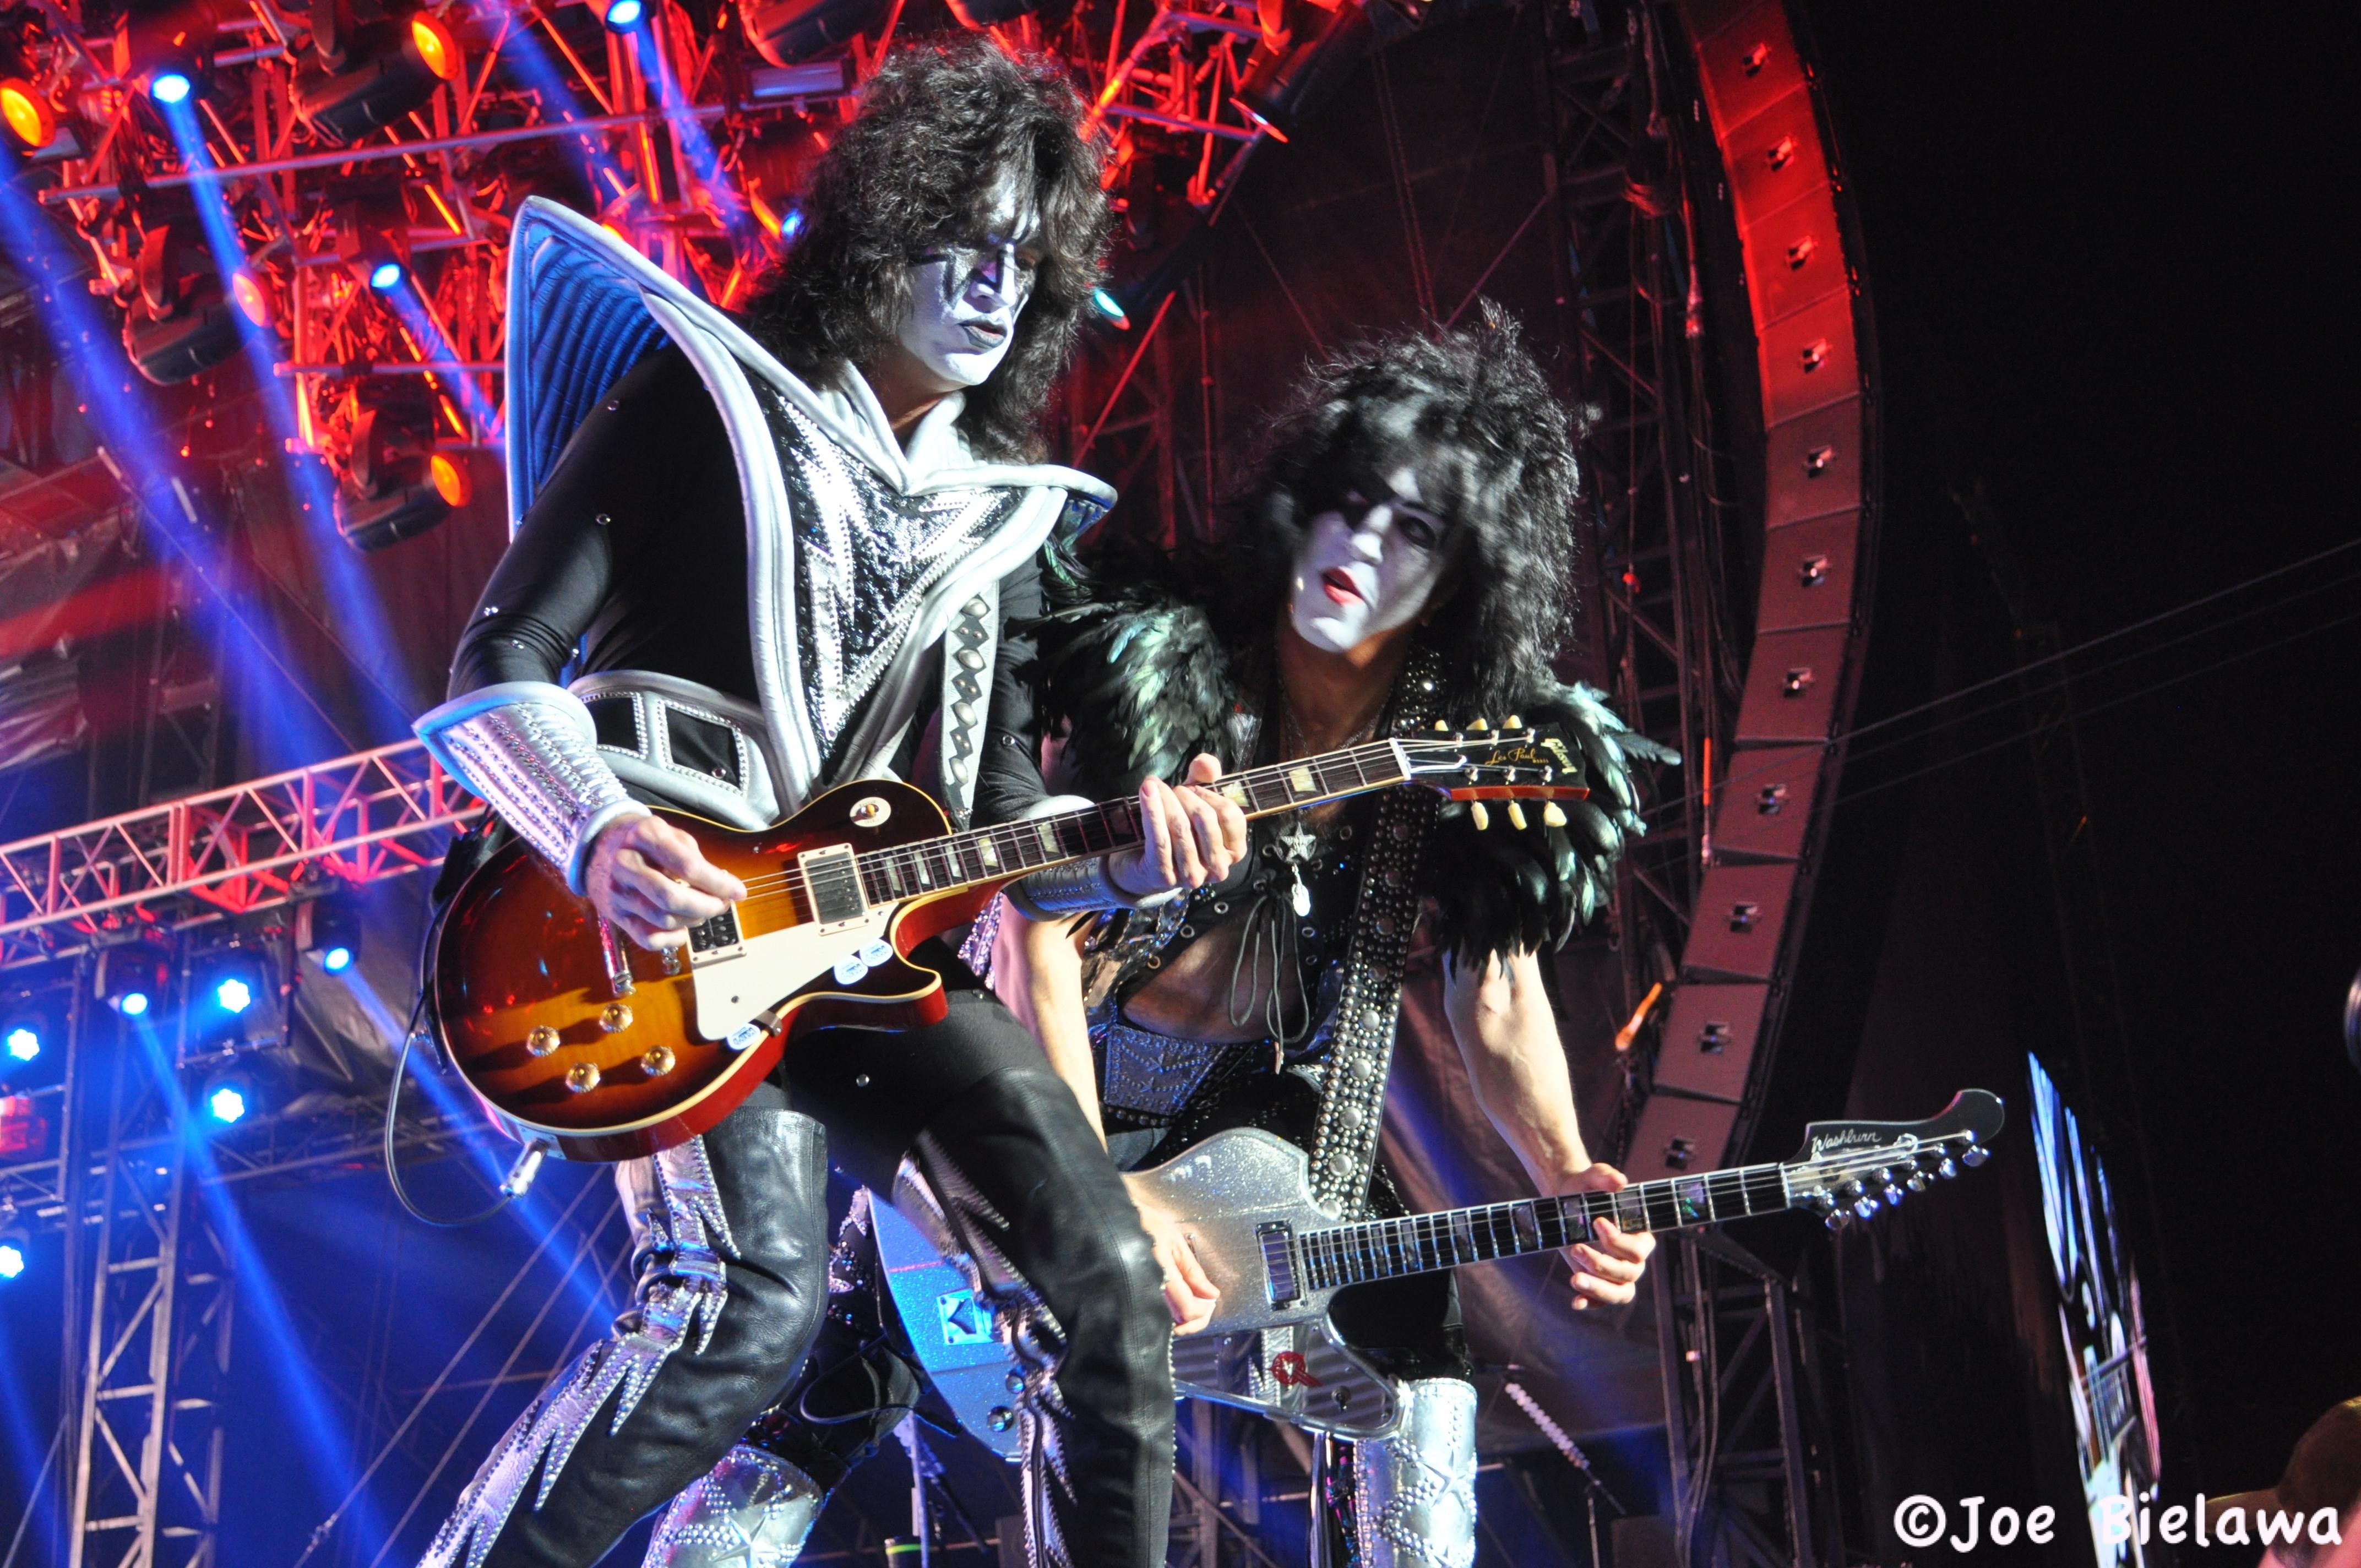 Kiss heavy metal rock bands concert guitar s wallpaper background 4288x2848